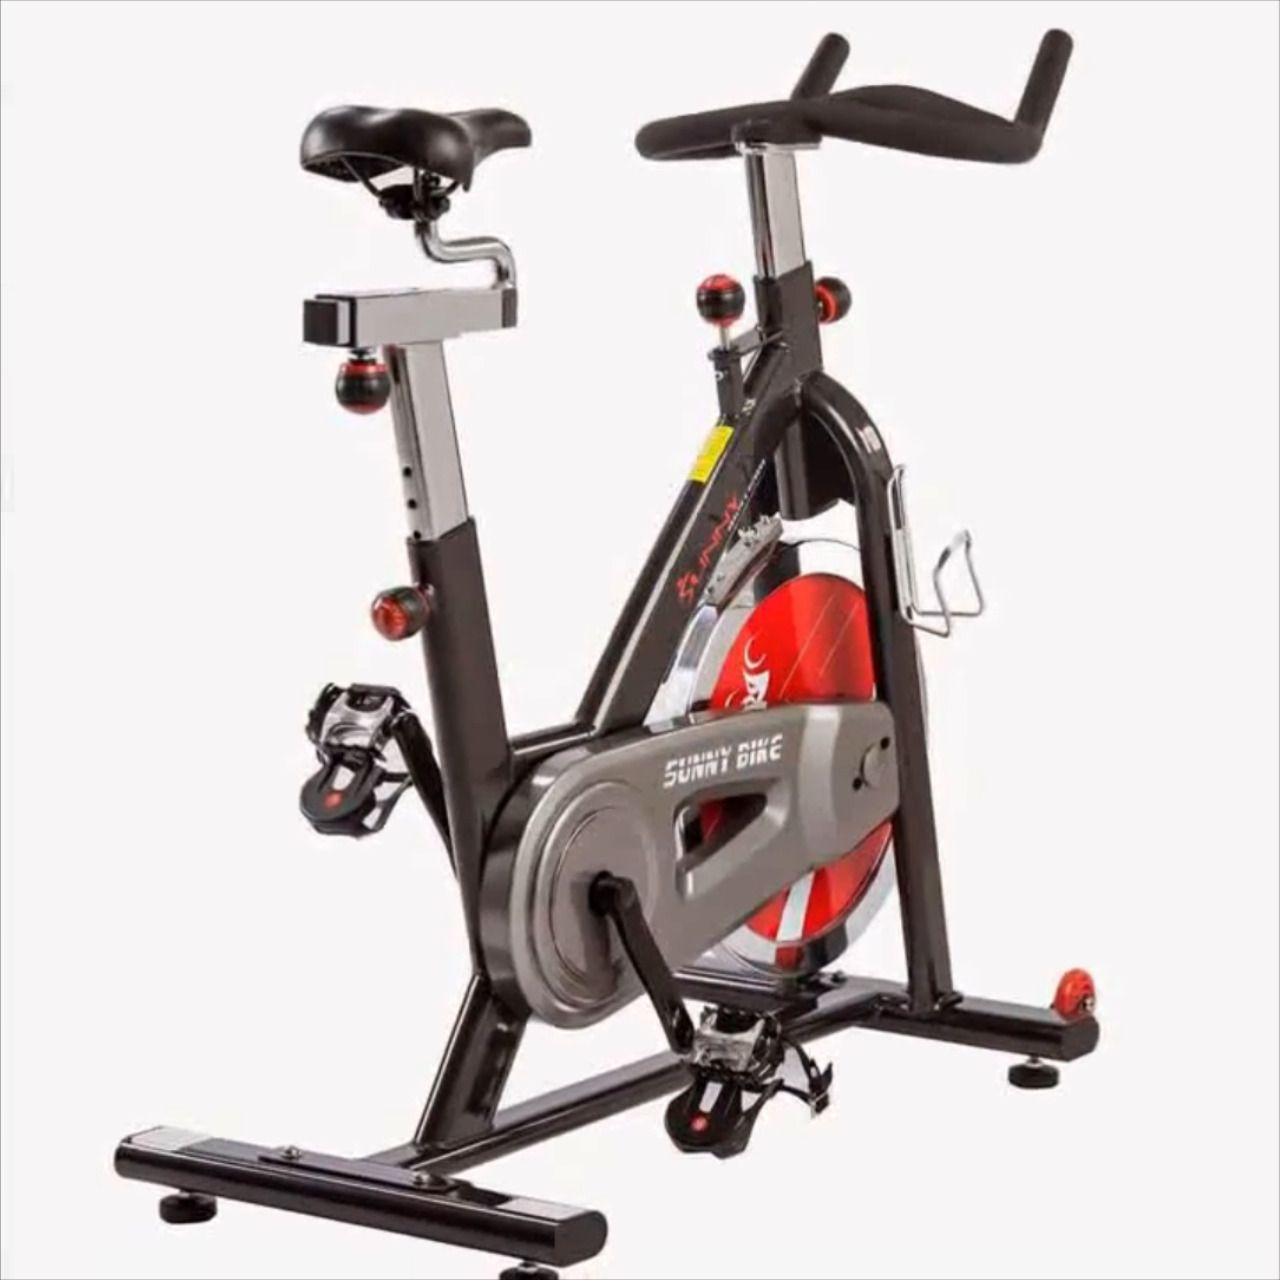 Exercise Bike Target Kmart Exercise Bike Schwinn 270 Recumbent Bike Reviews Peloton Vs Proform Lifecycle Recumbent Biking Workout Exercise Bikes Bike Seat